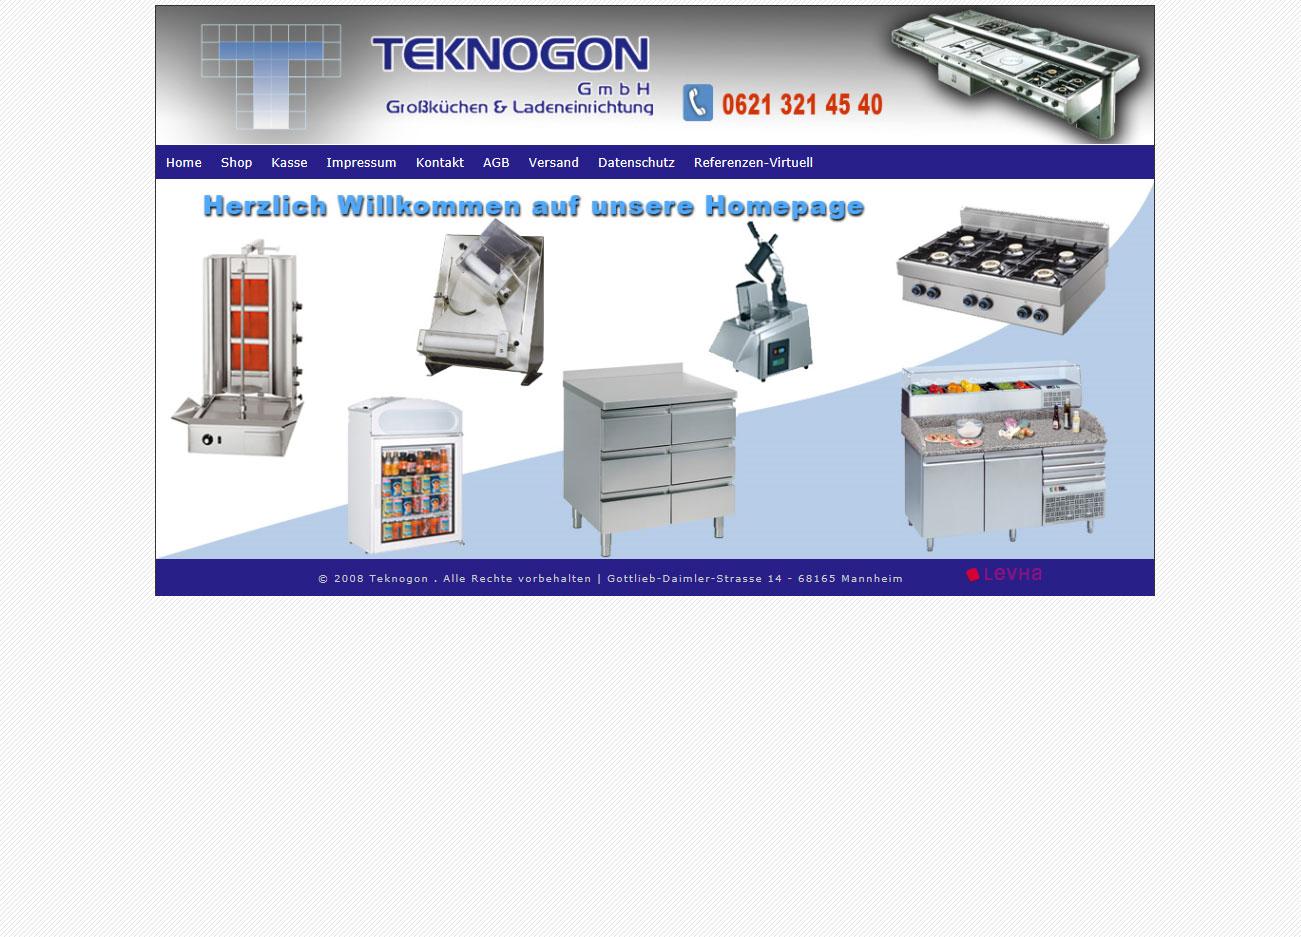 Teknogon GmbH